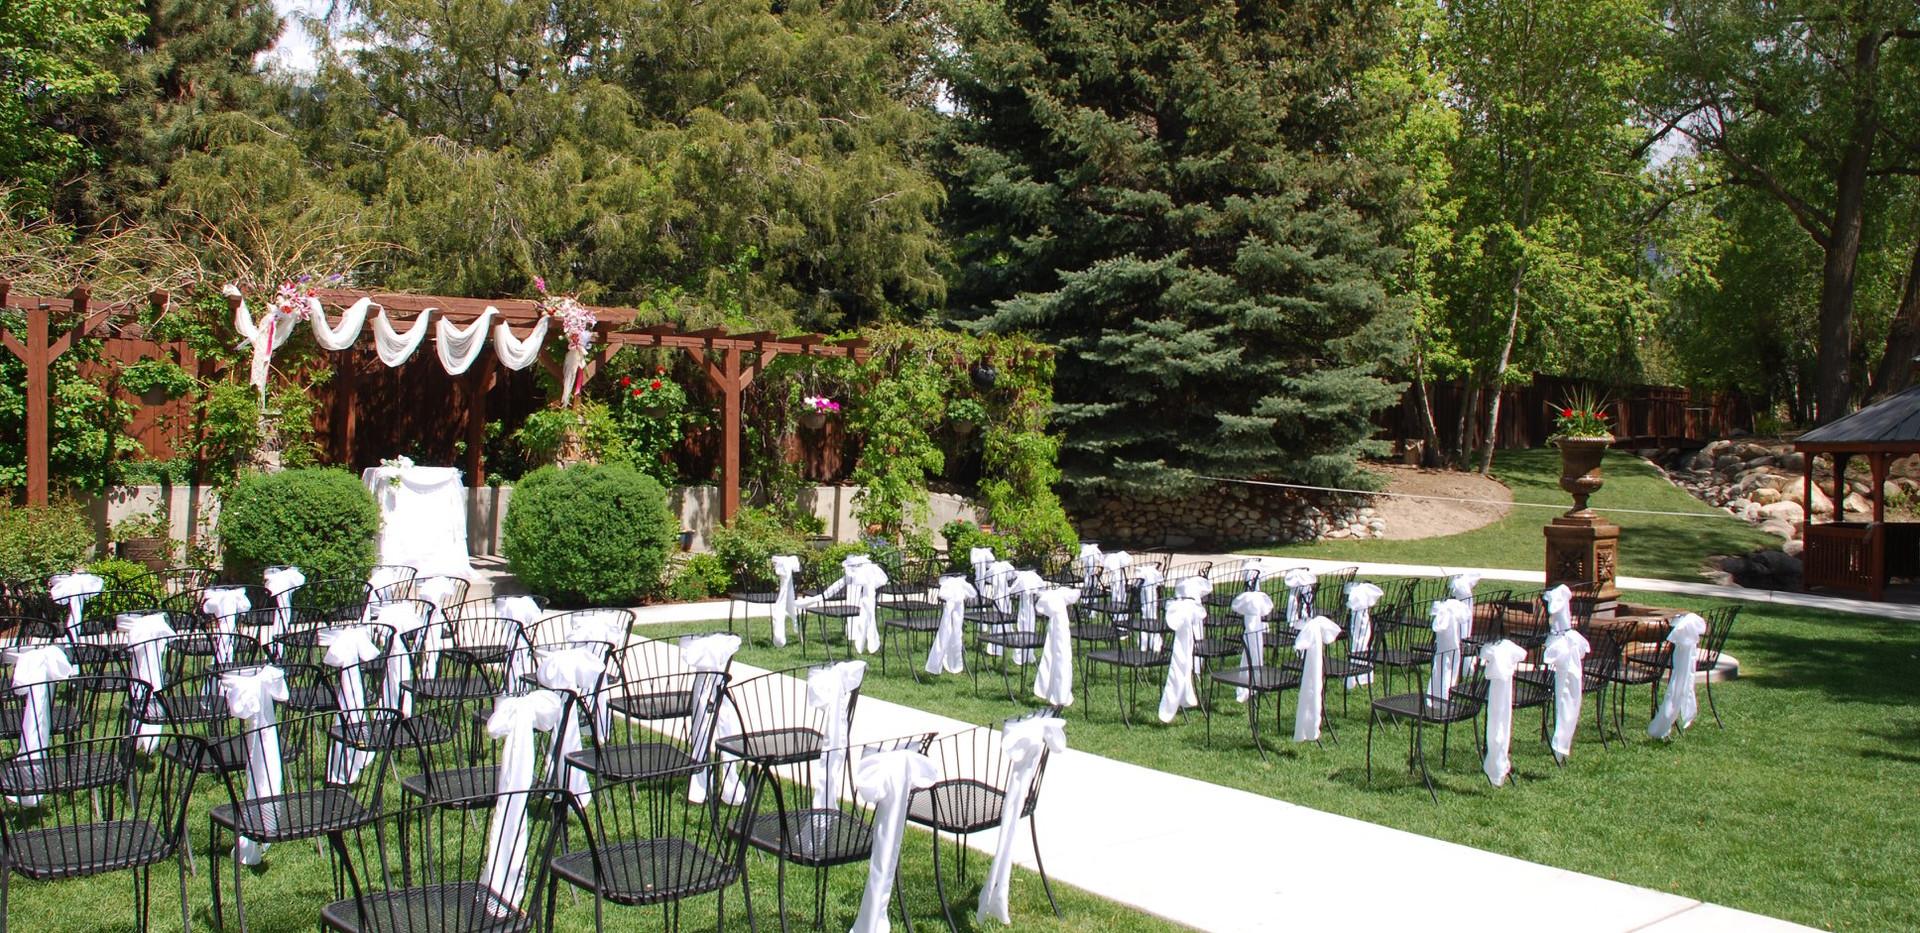 alpine-arts-center-utah-venue-garden-15.